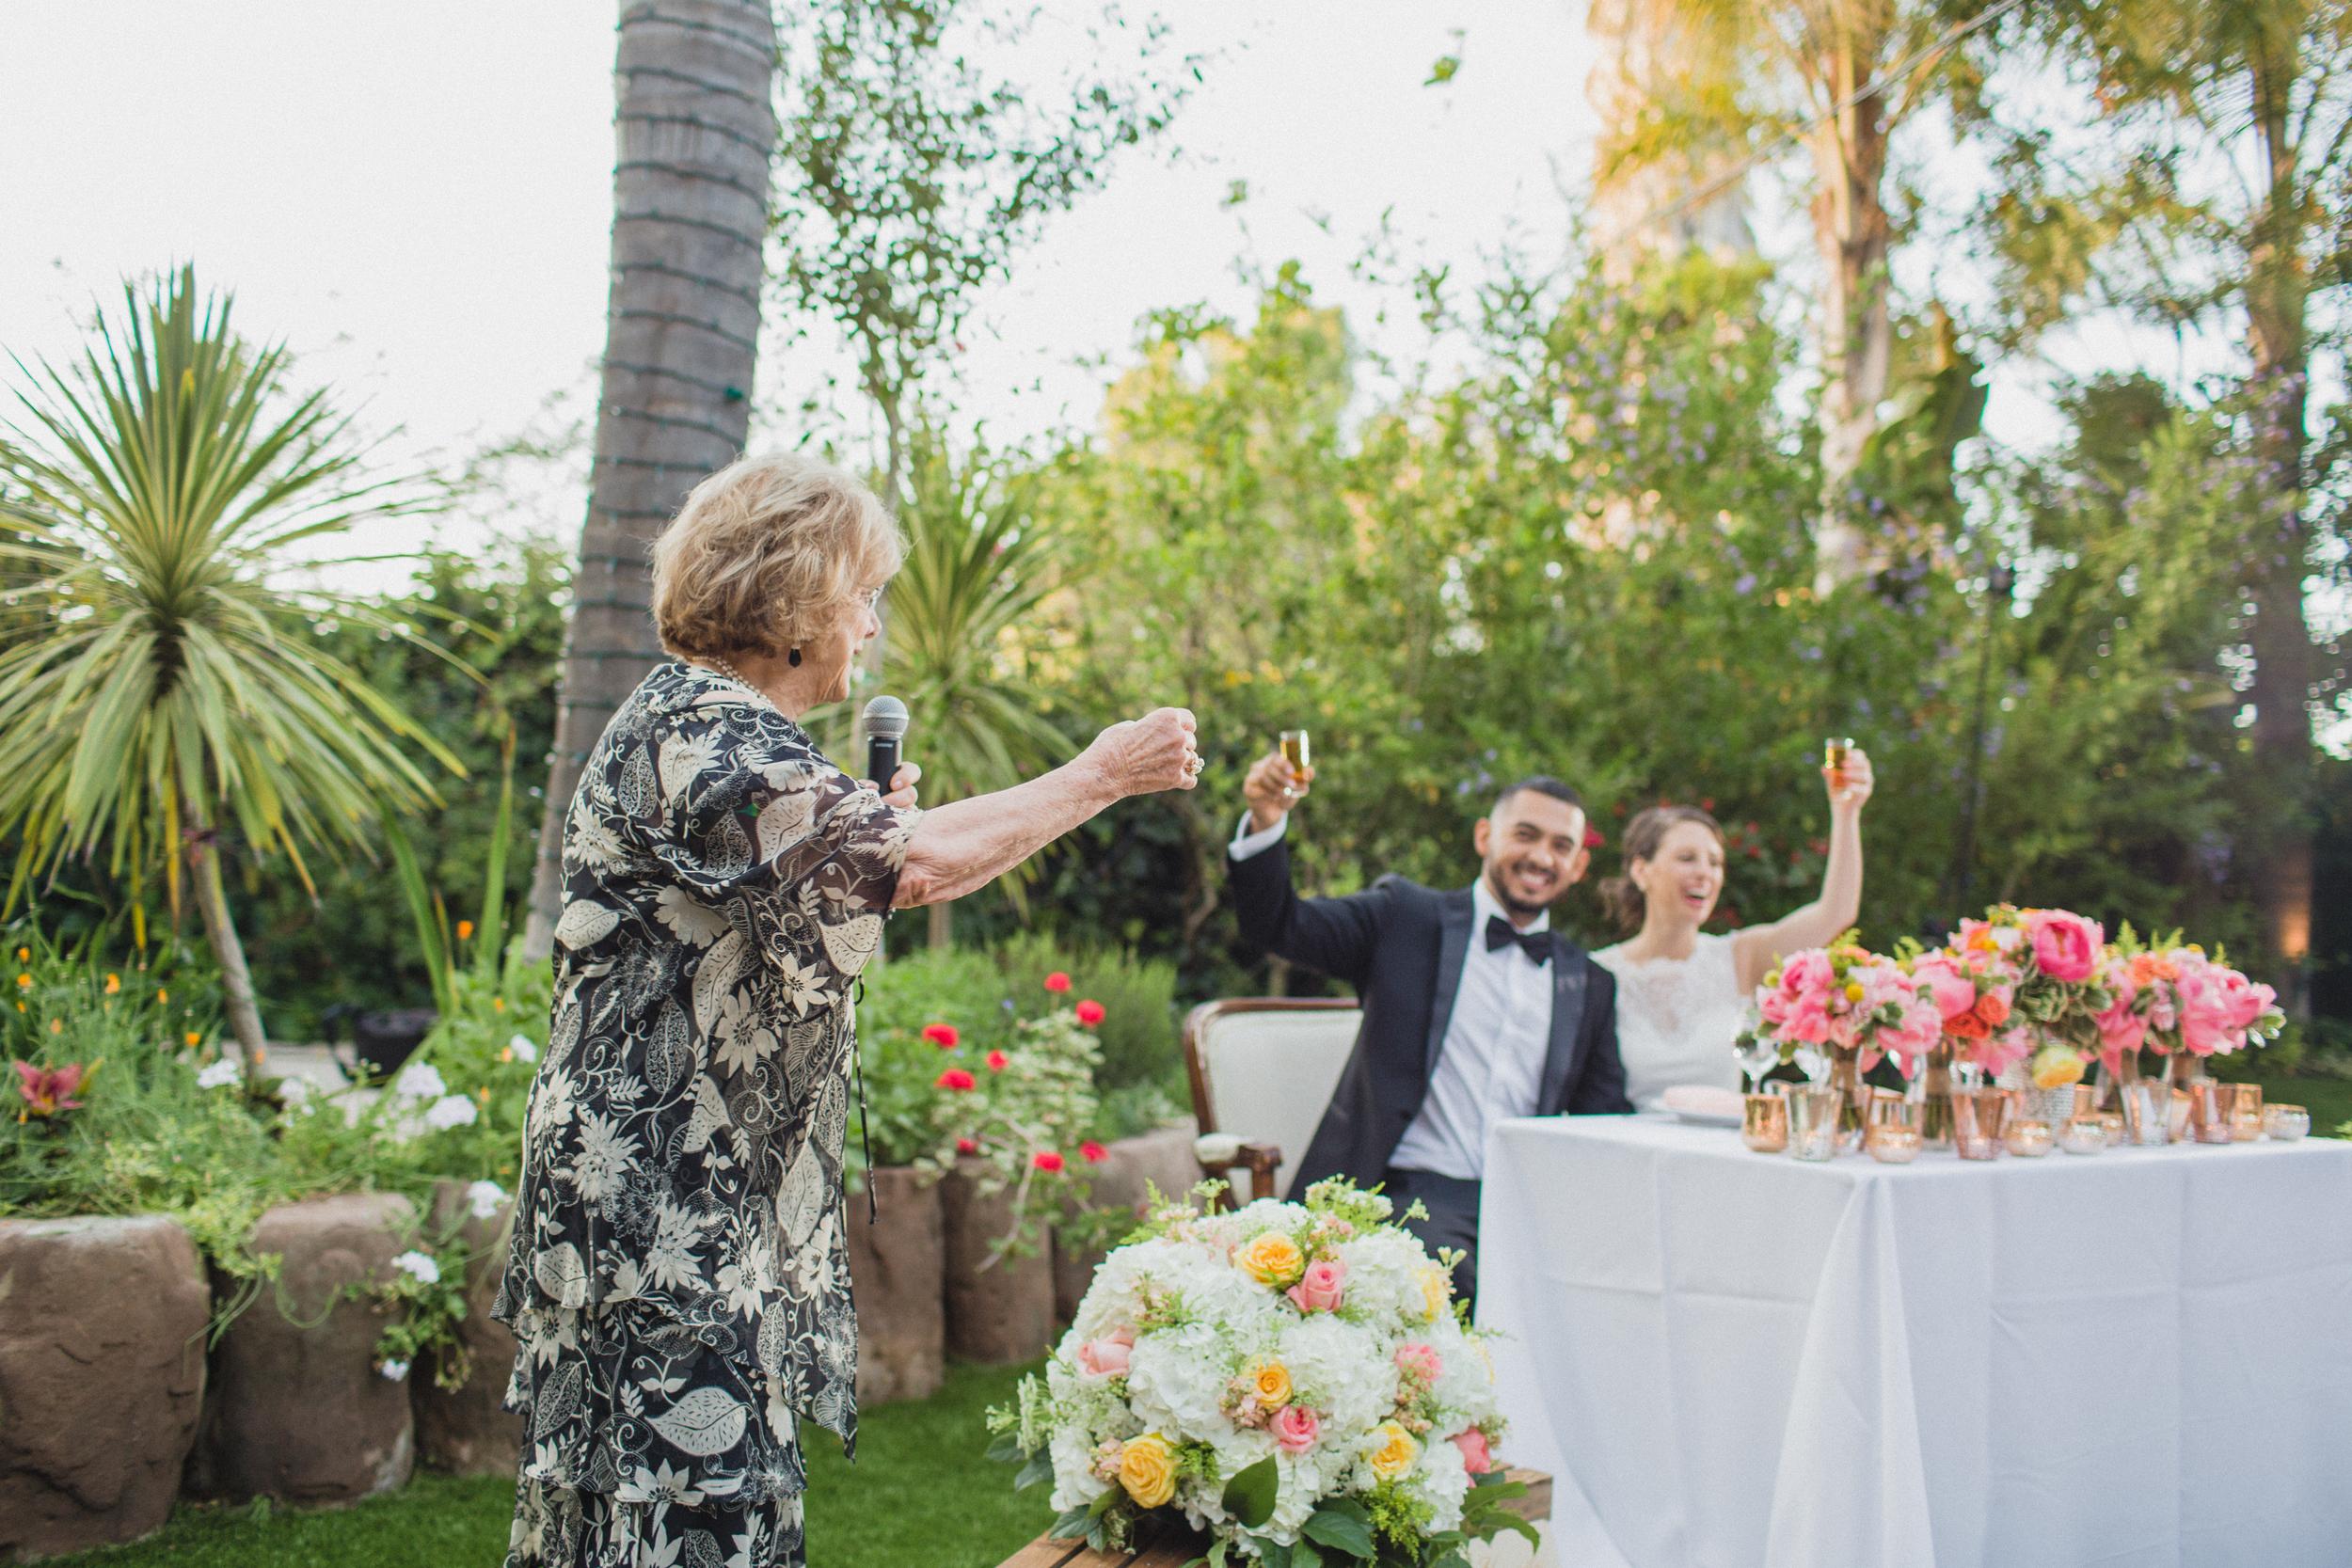 069 Hartley Botanica Wedding Photography Cotton Love Studios.jpg